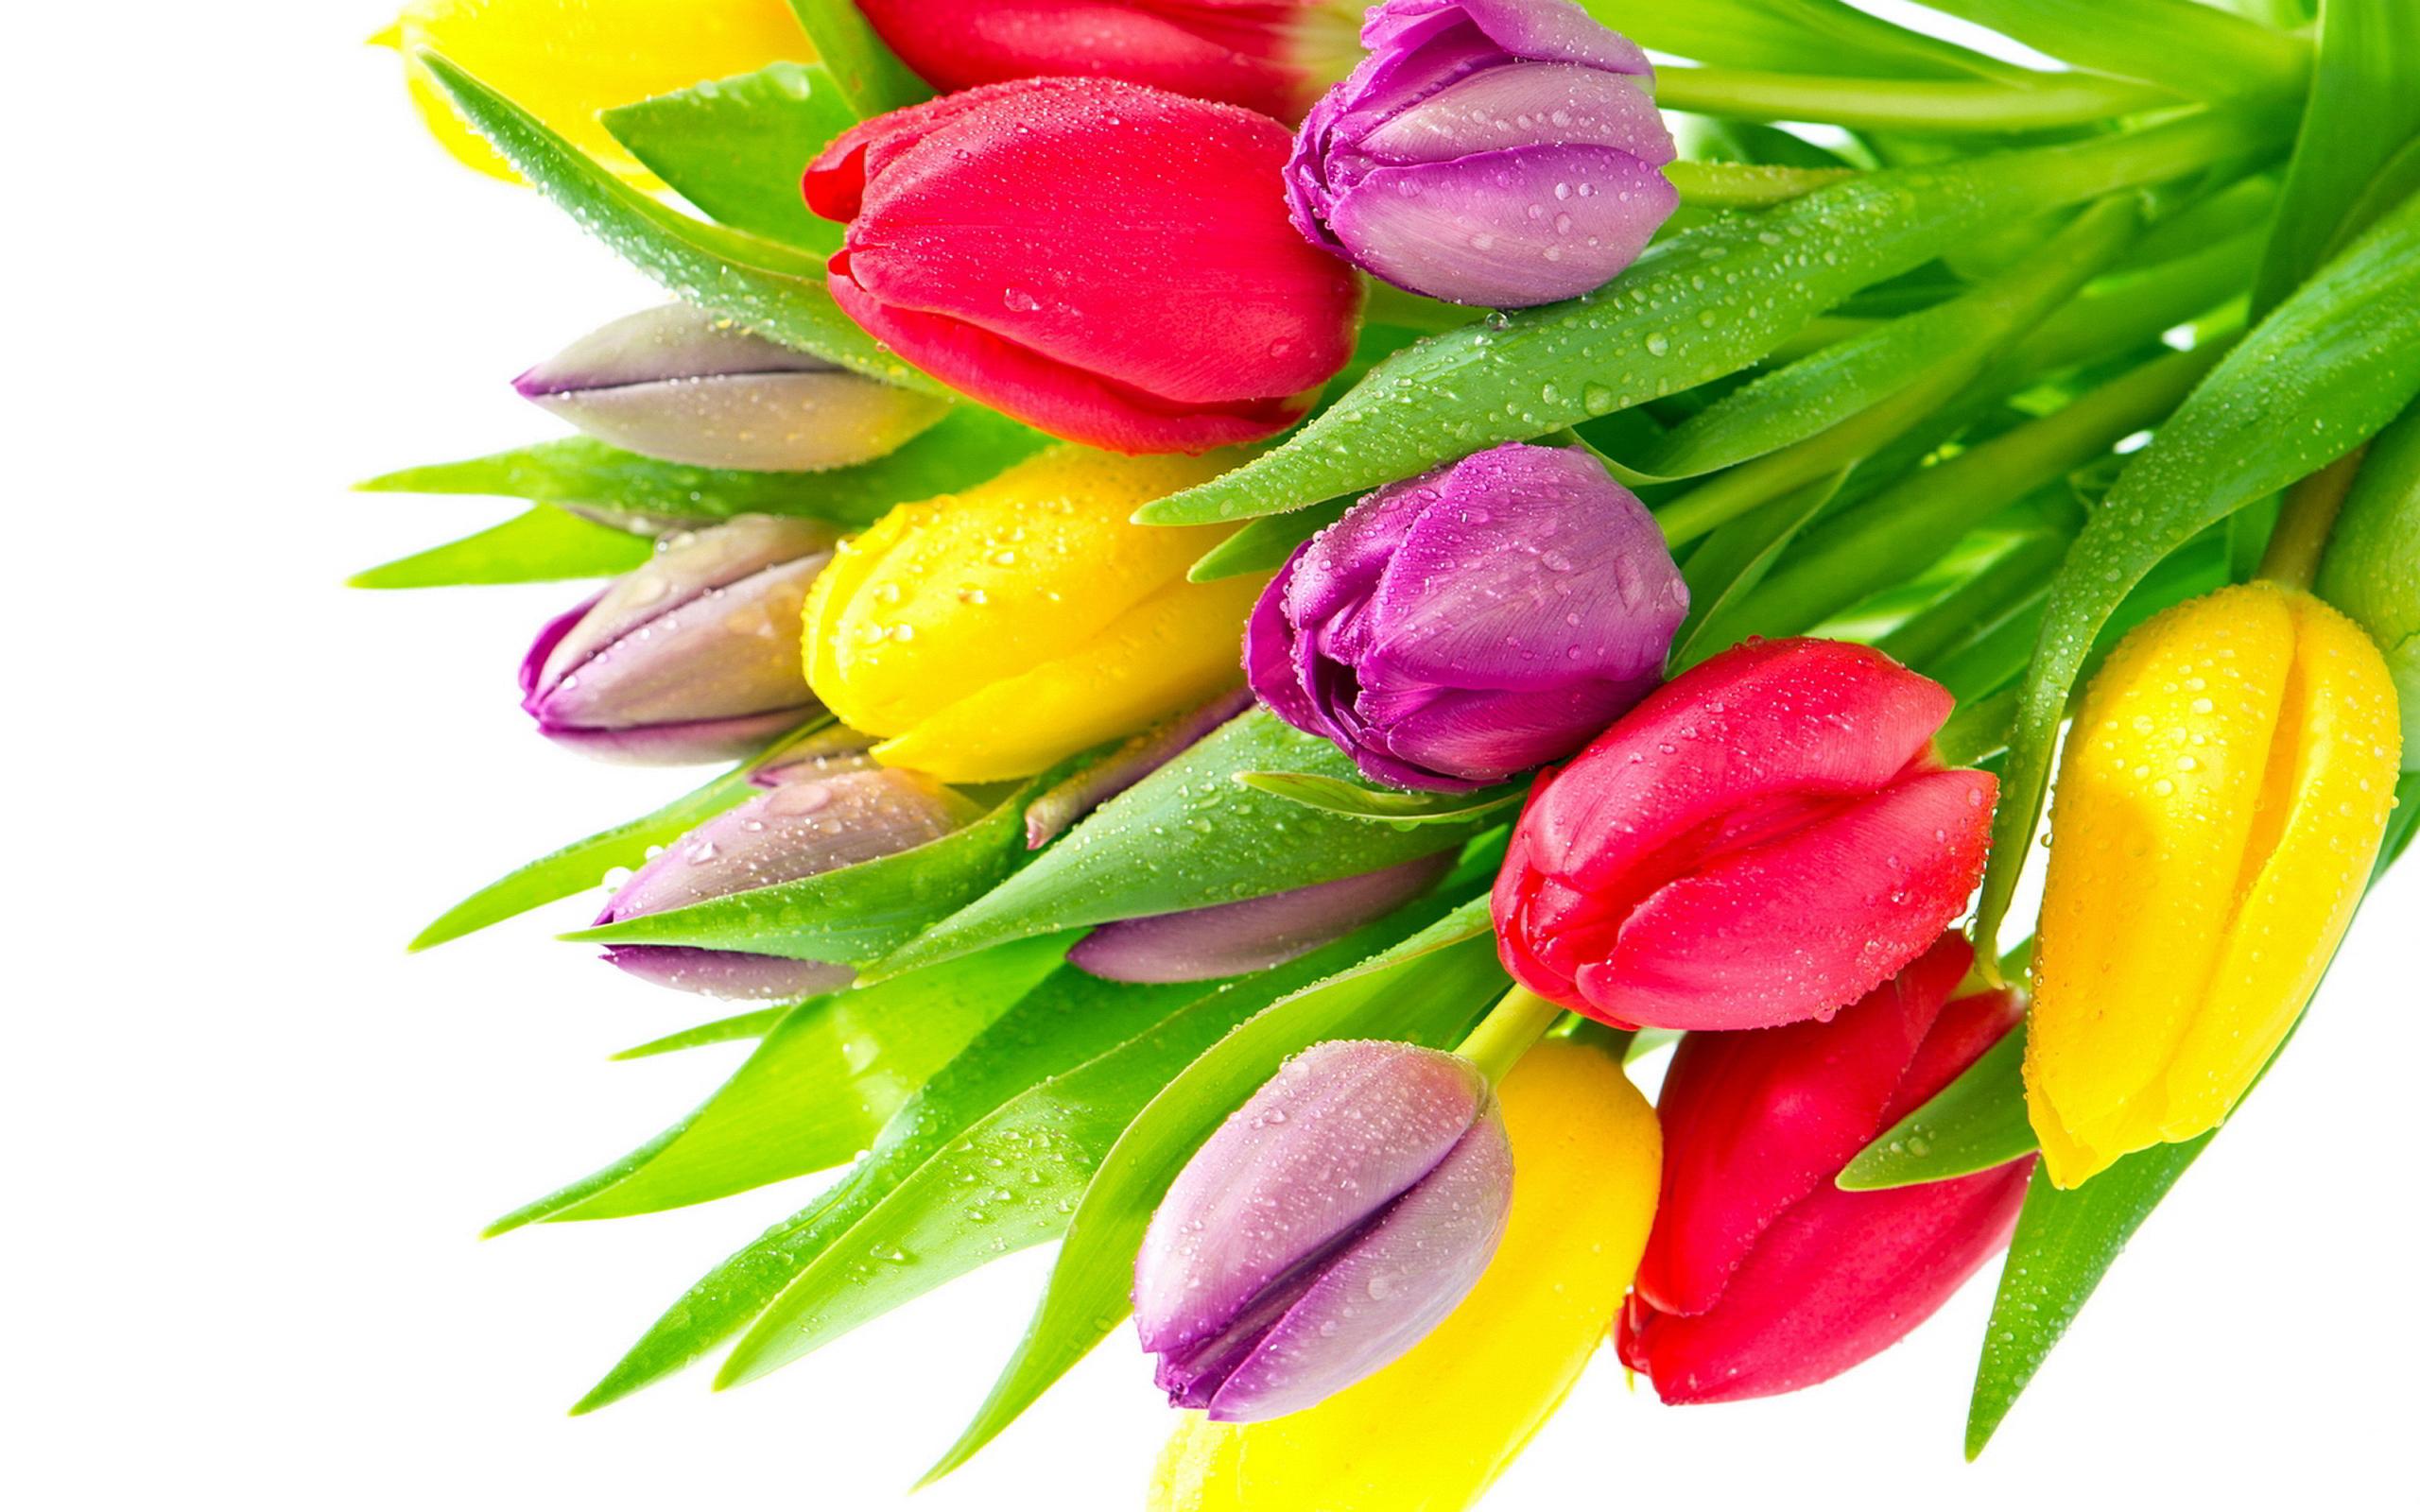 Colorful Tulip Flowers HD Desktop Wallpaper HD Desktop Wallpaper 2560x1600